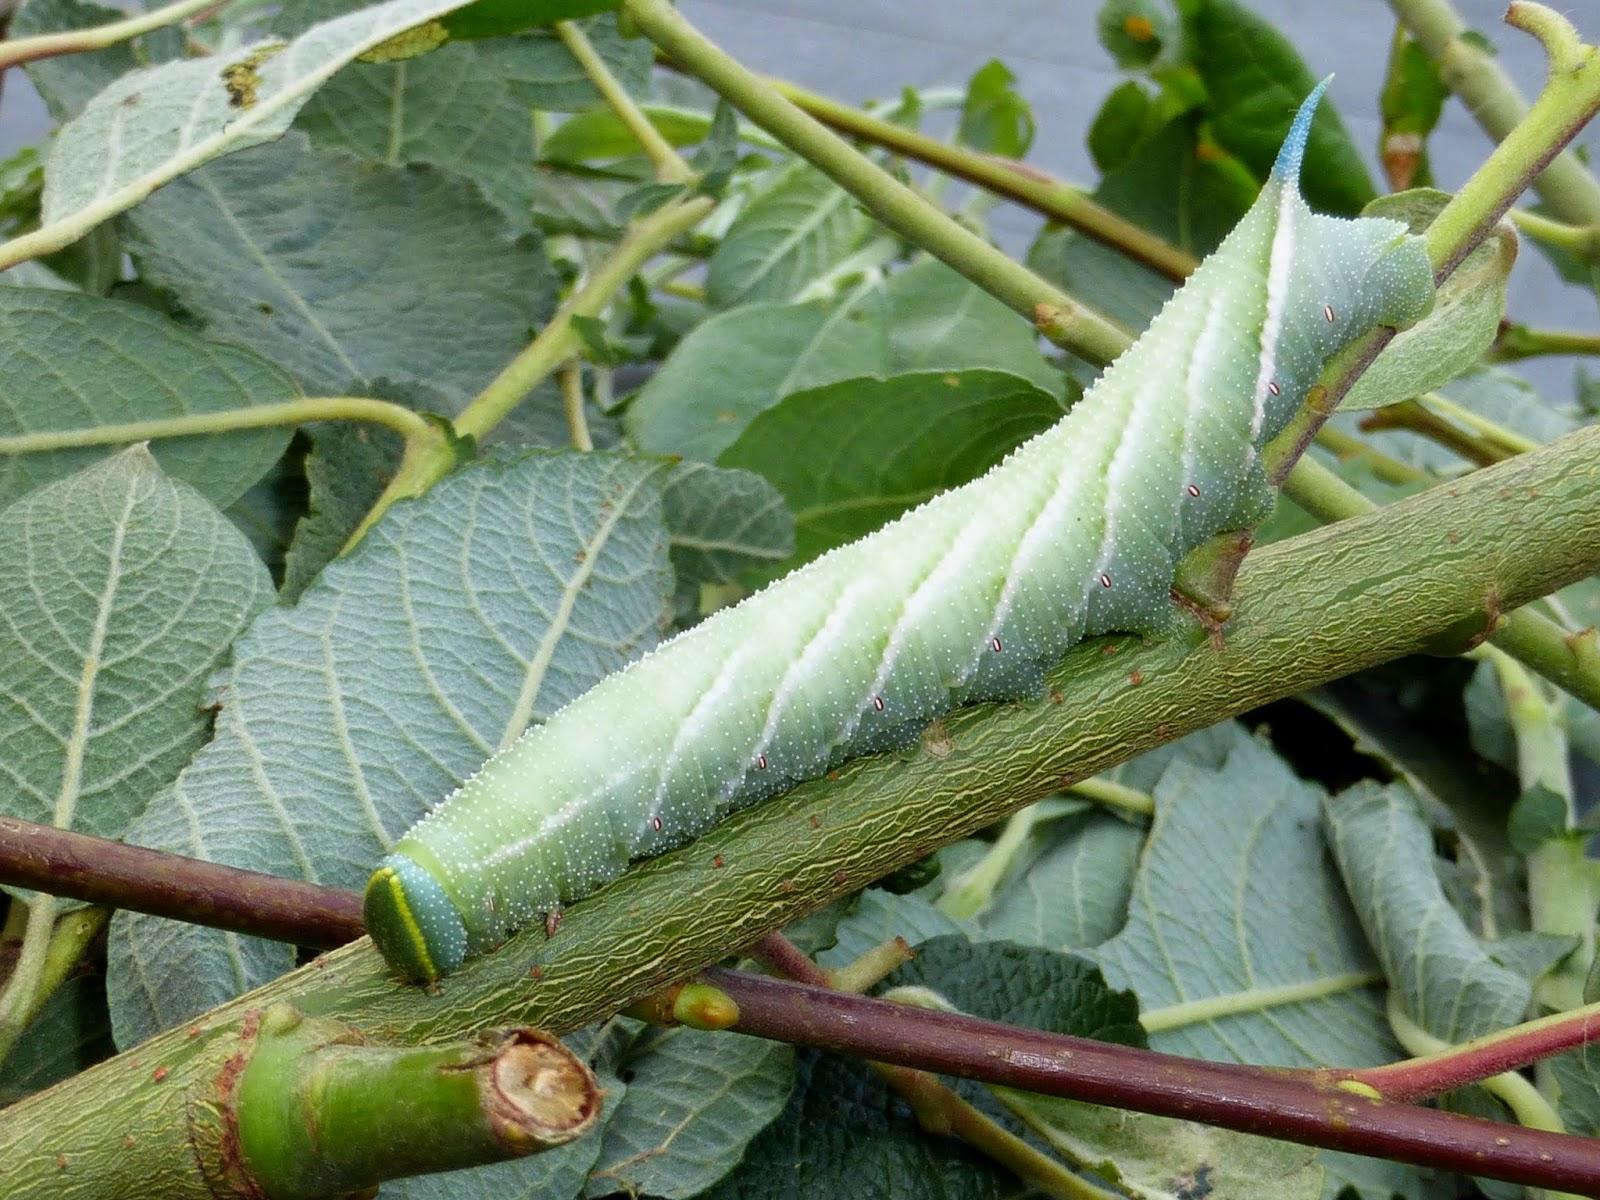 Smerinthus ocellata caterpillar L5